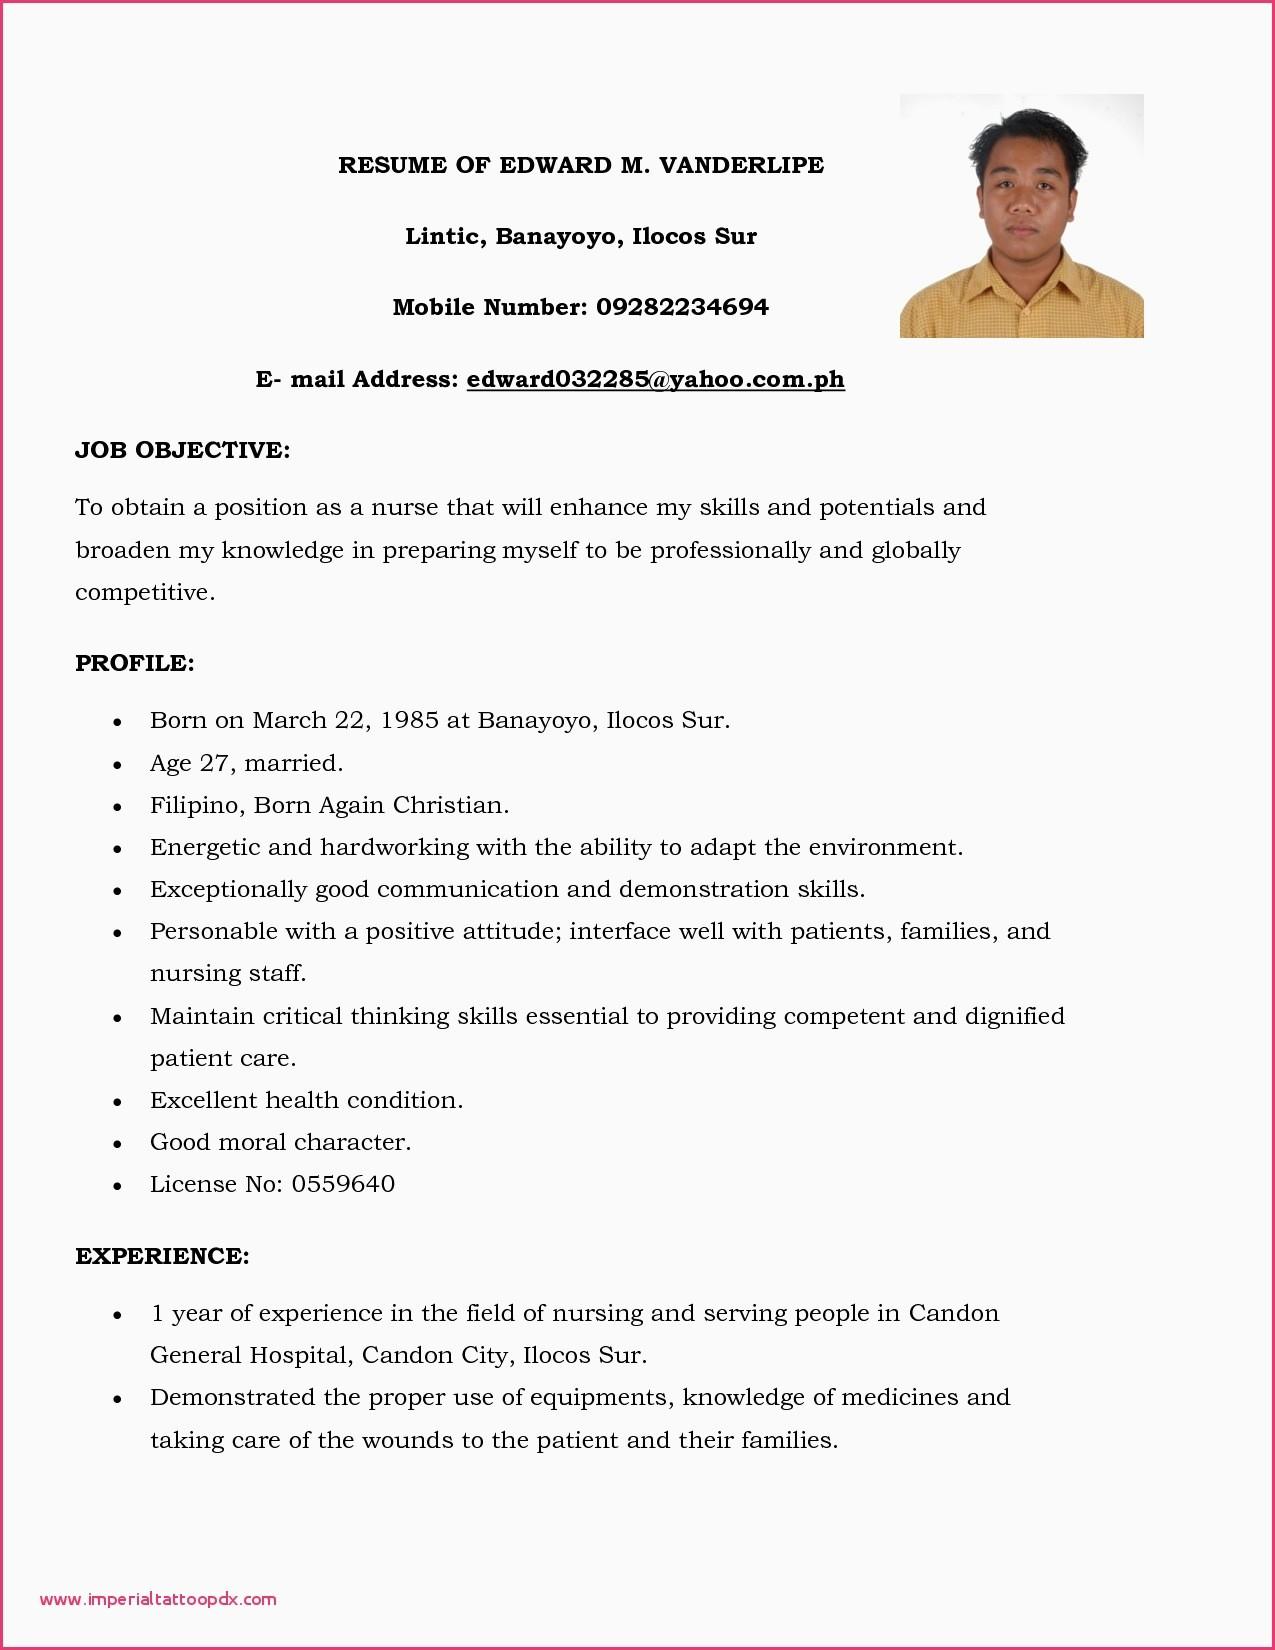 Cv format Pdf Bangladesh Best Of Curriculum Vitae Sample for